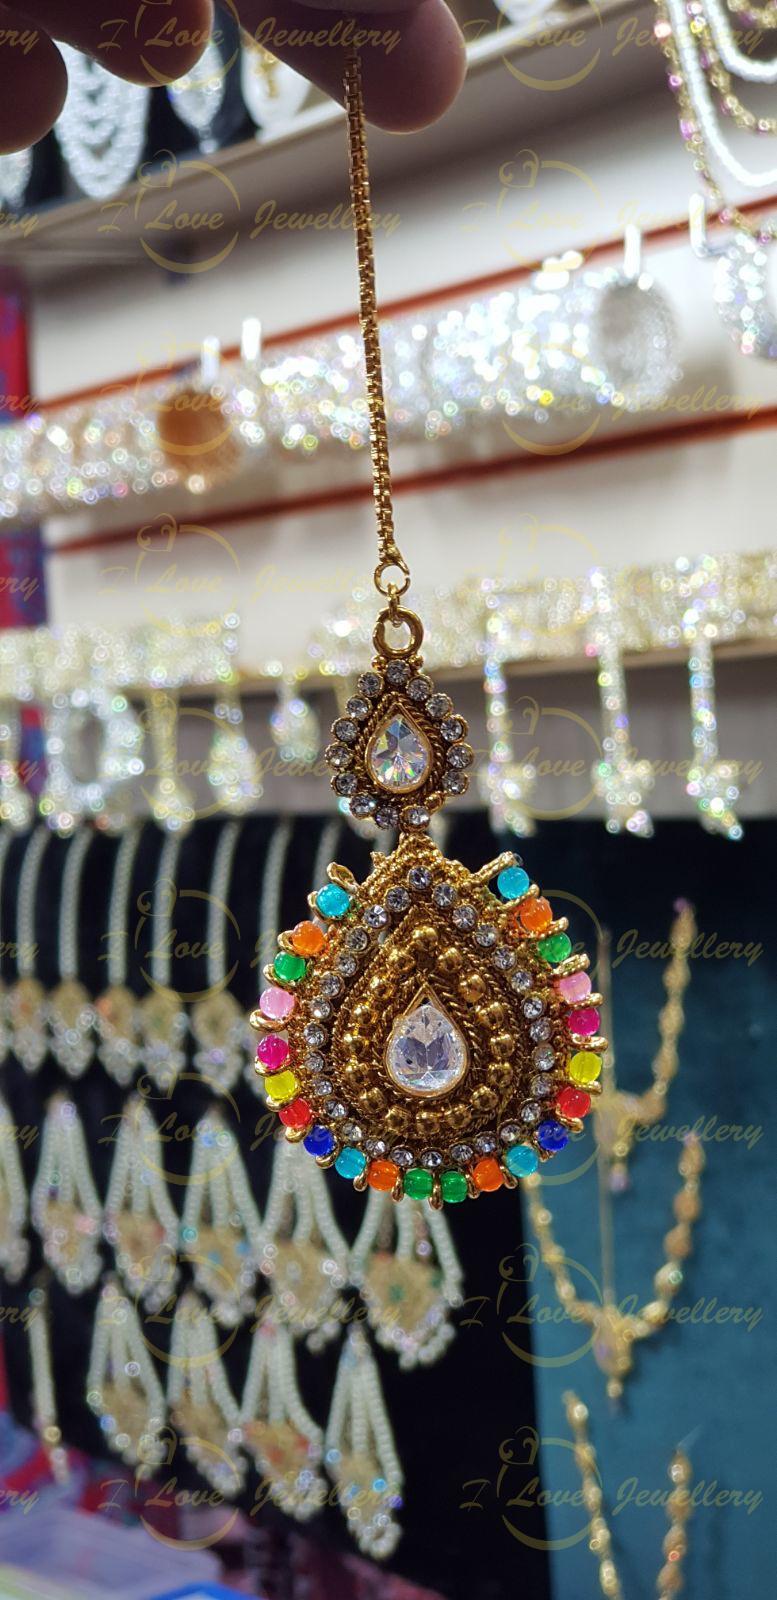 Mehndi Jhoomar tikka - bindi tikka - collection of mehndi jhoomar tikka sets - wholesale Pakistani jewellery - bespoke Pakistani jewellery